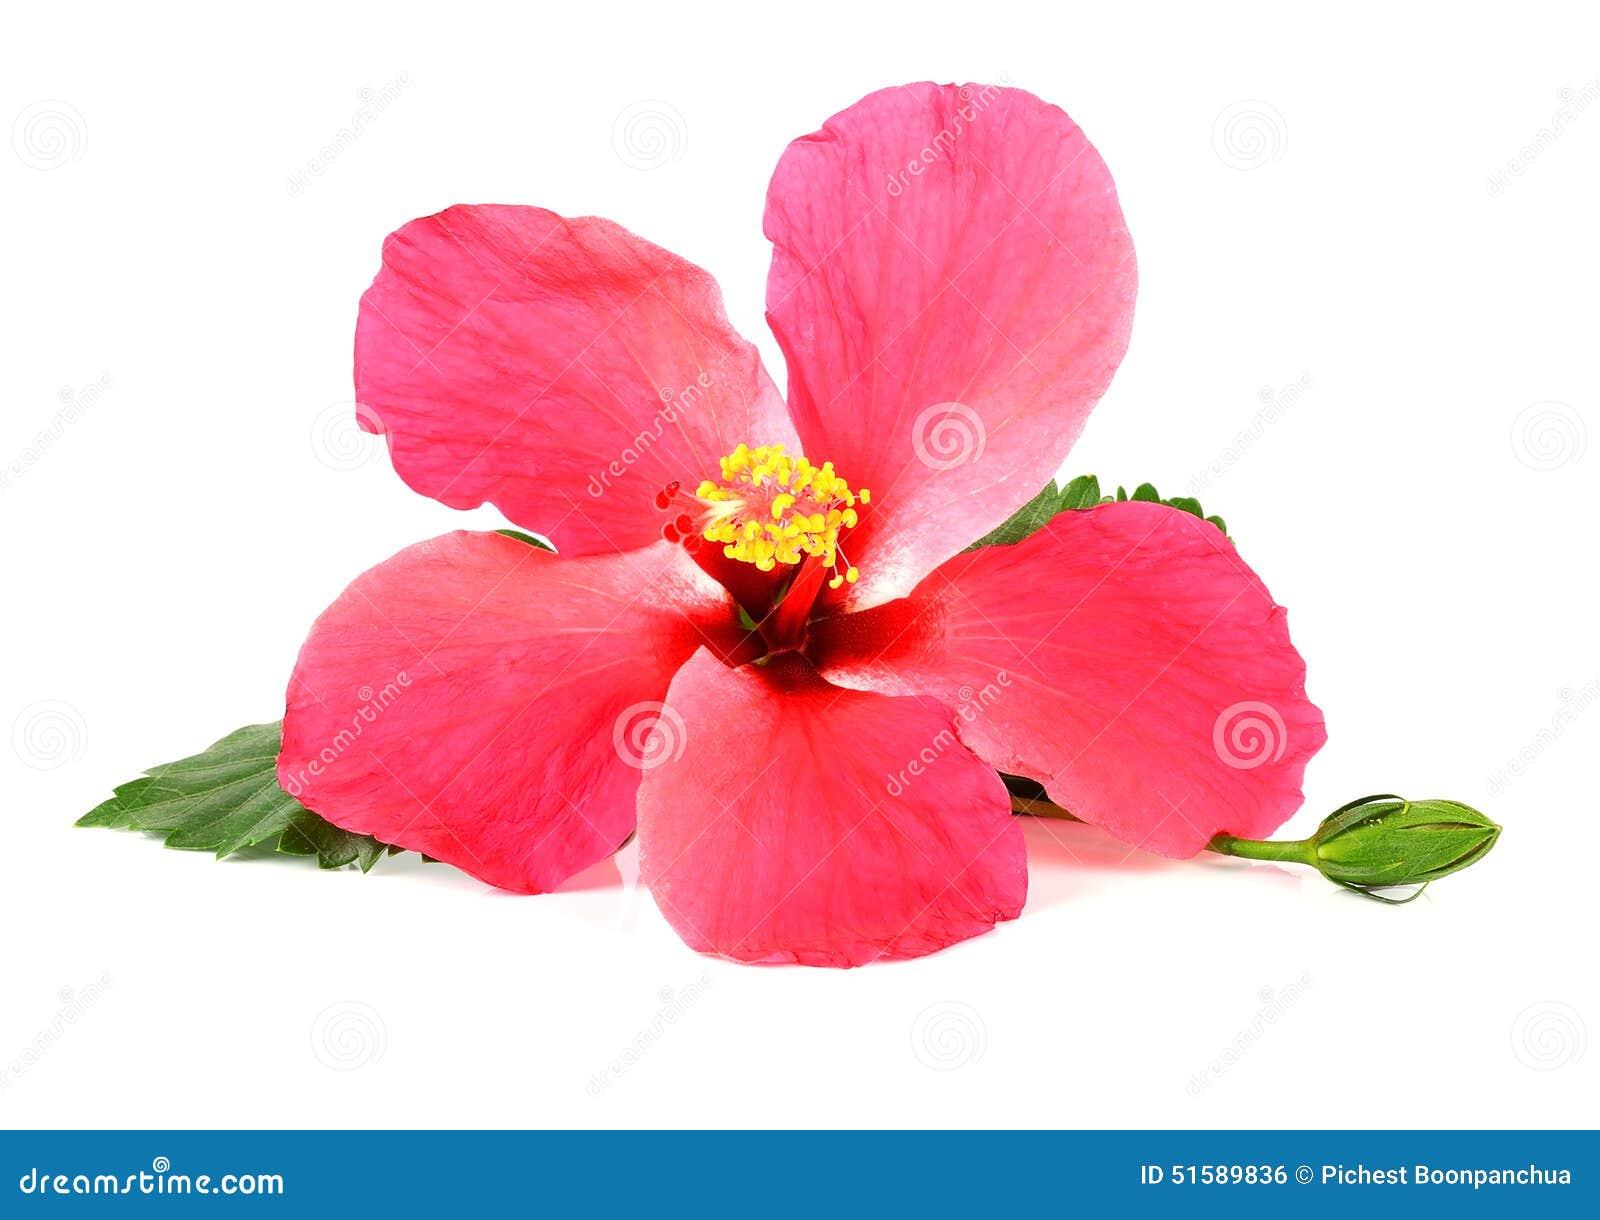 Pink hibiscus flower isolated on white background stock photo pink hibiscus flower isolated on white background izmirmasajfo